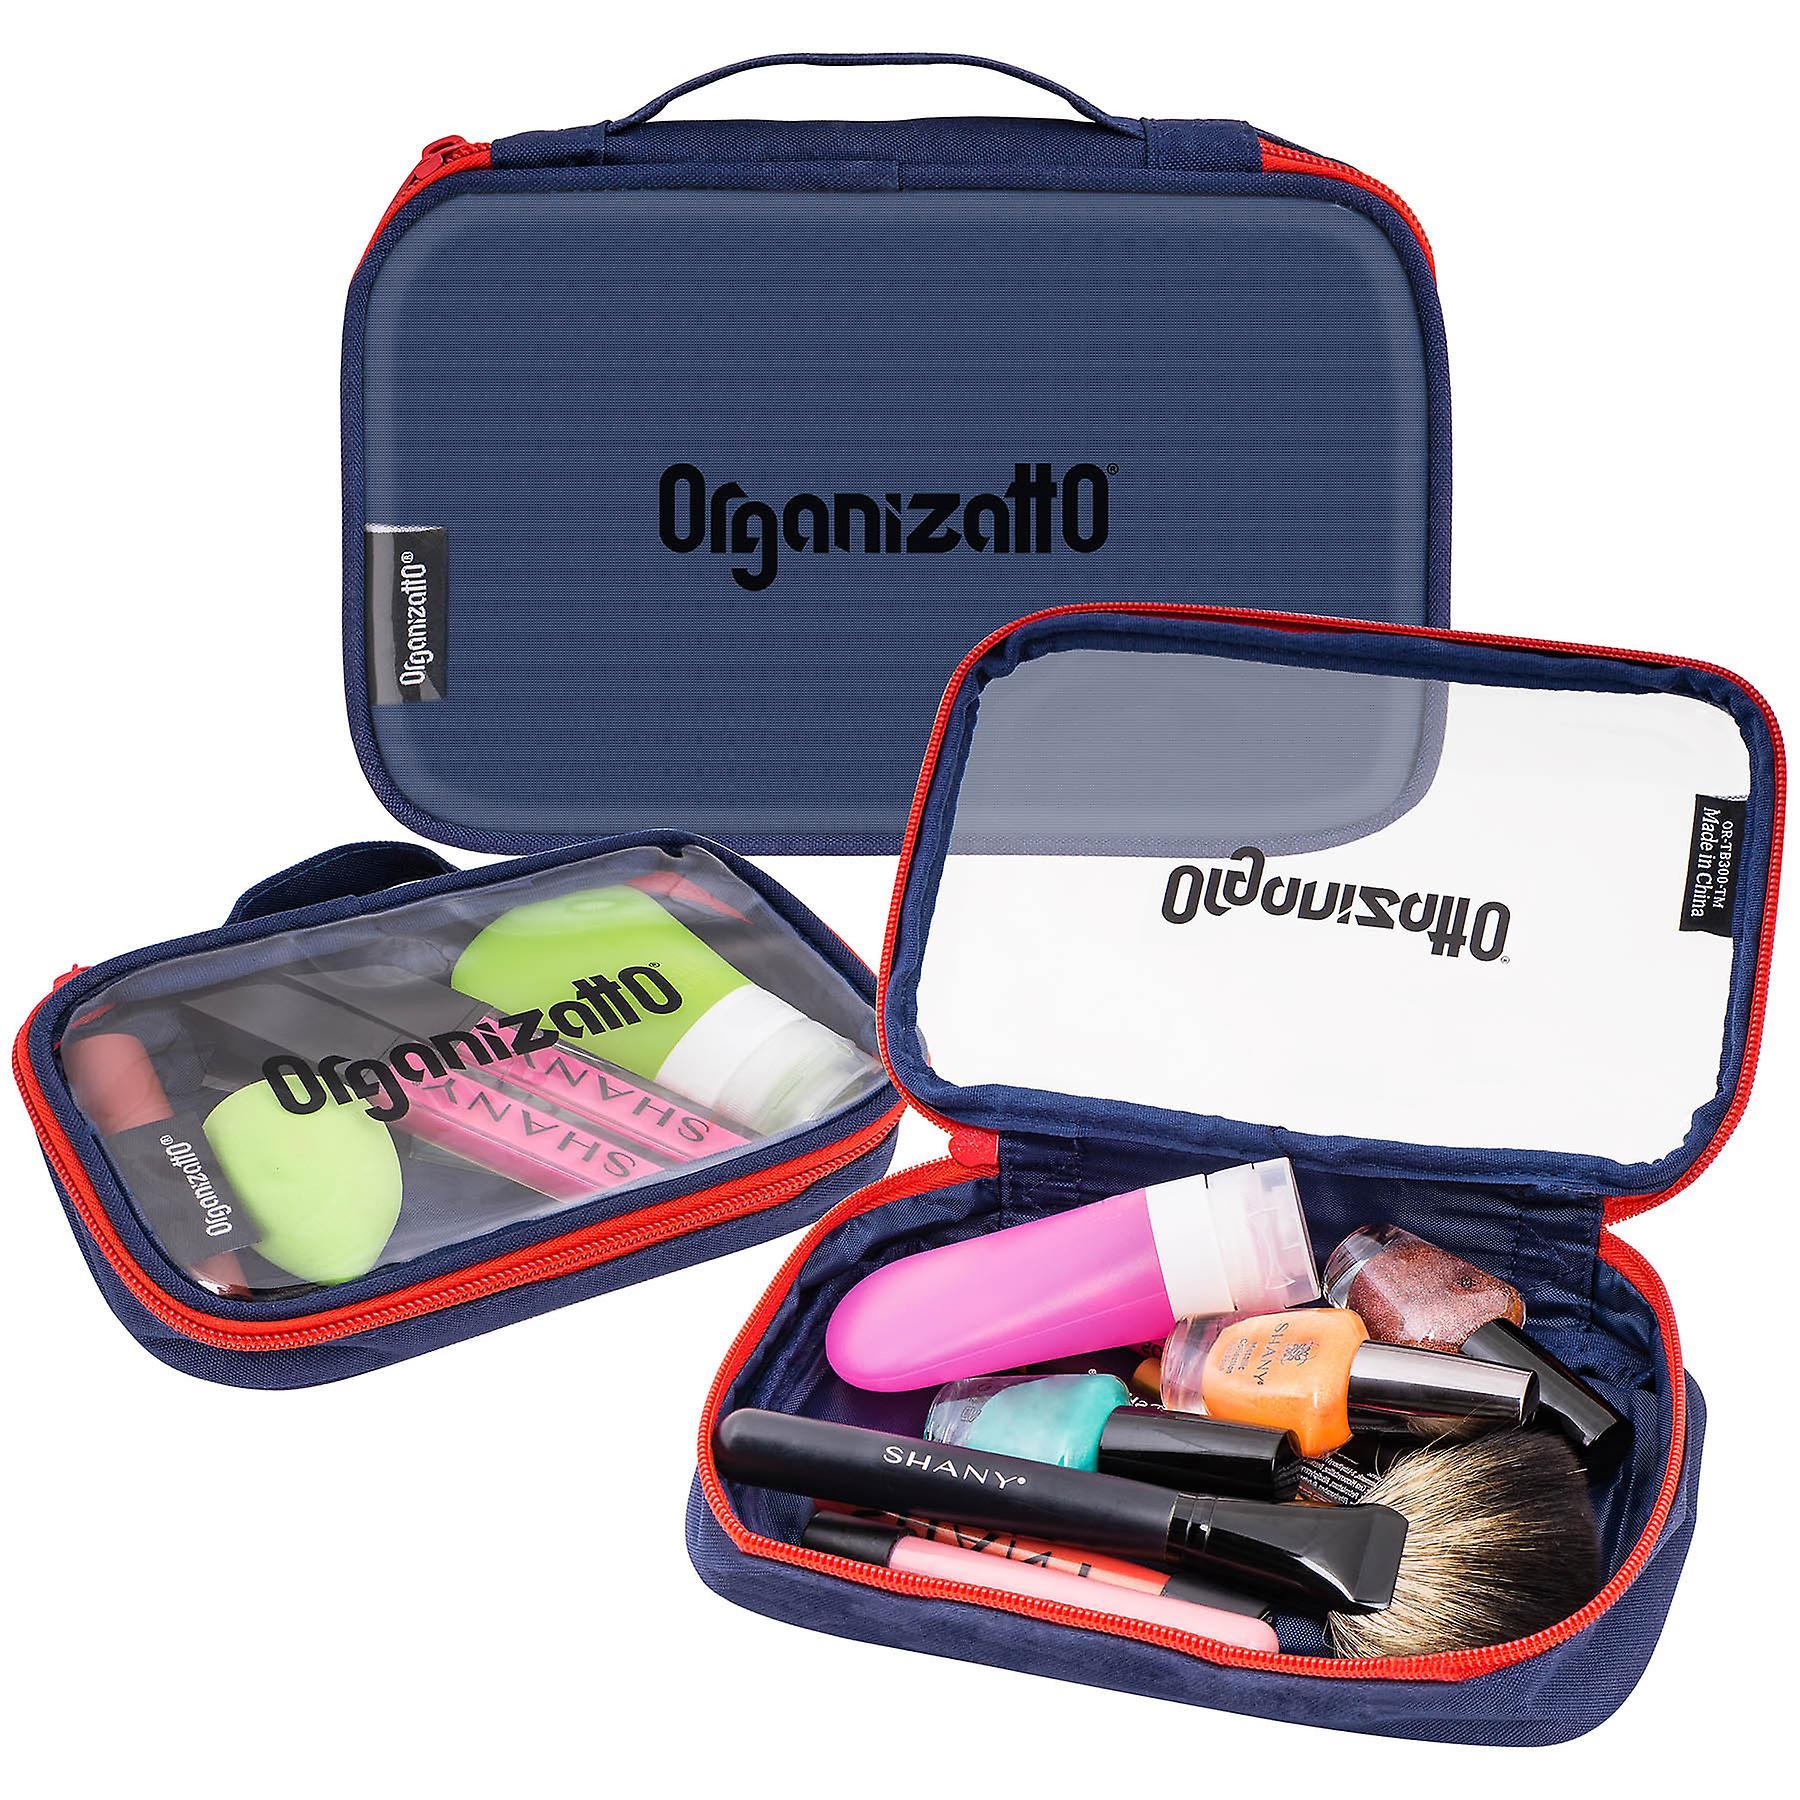 Organizatto Cosmetics Organizer 3-in-1 Set - Three Portable Zipper Cloth Handbags with Clear PVC Opening in Navy Blue - 3 PC